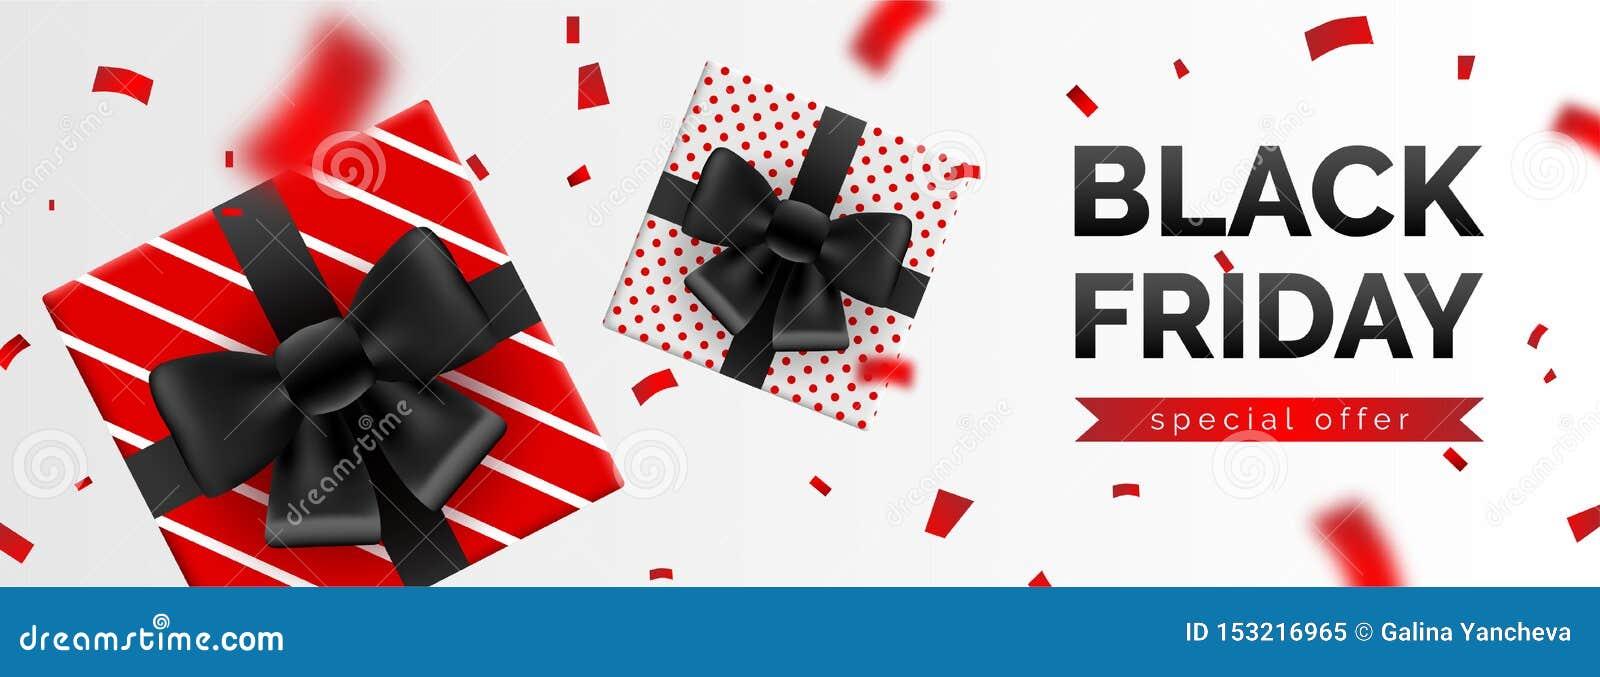 Black Friday-Verkaufsfahne, Schablone für Social Media-Postenförderung